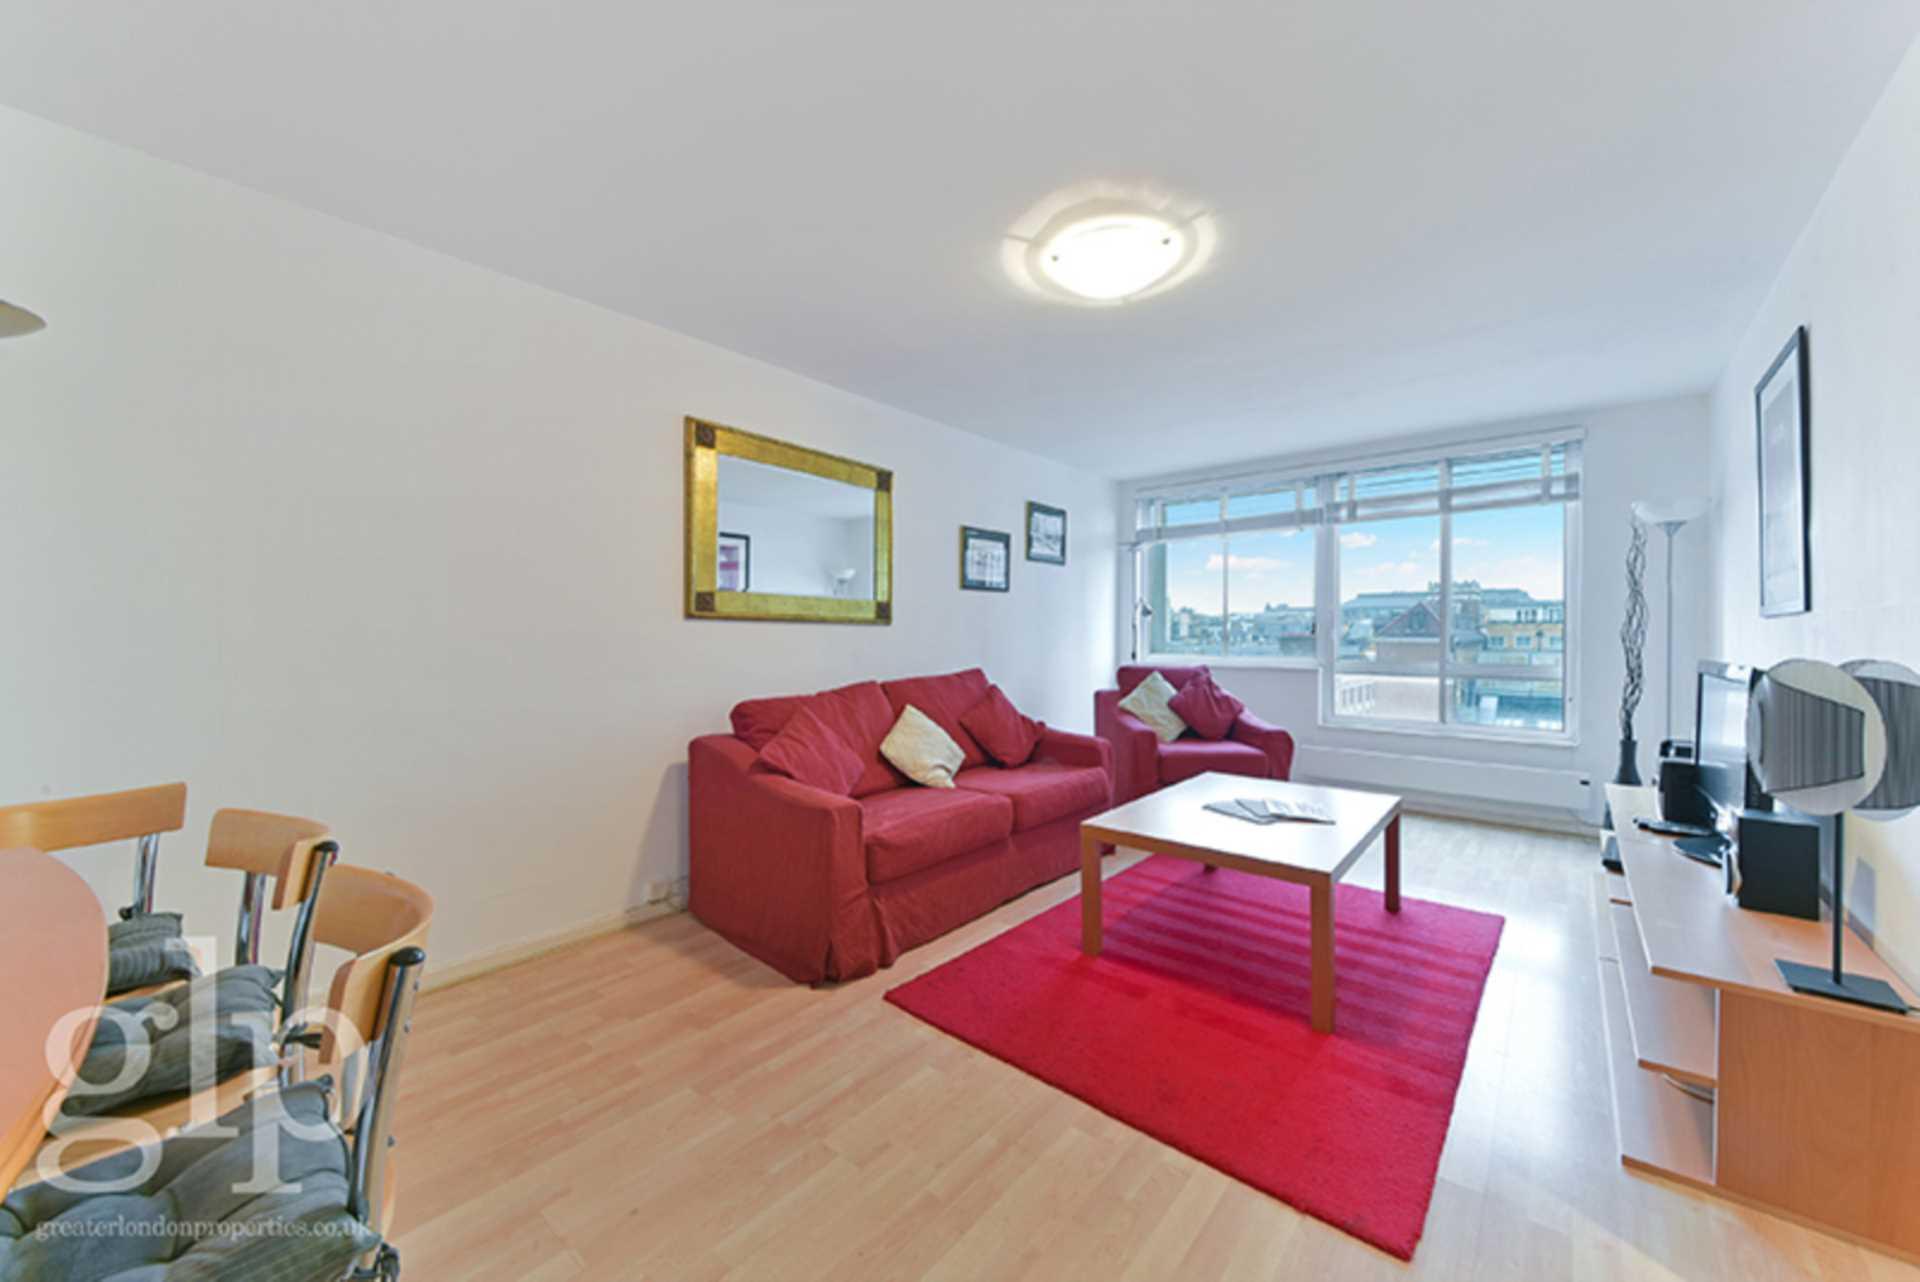 6082 1, Greater London Properties